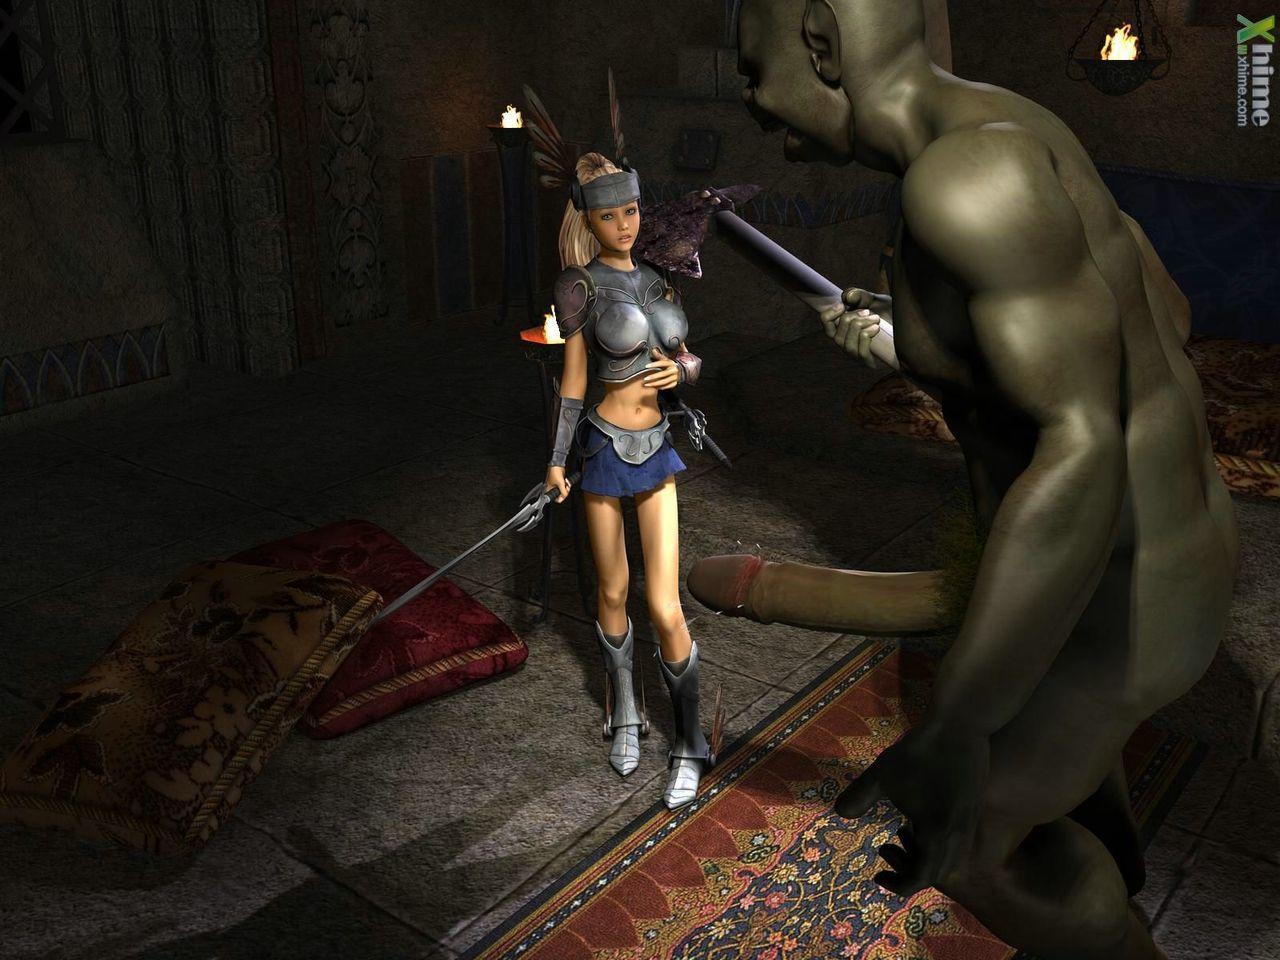 fantasy cg collection - part 4